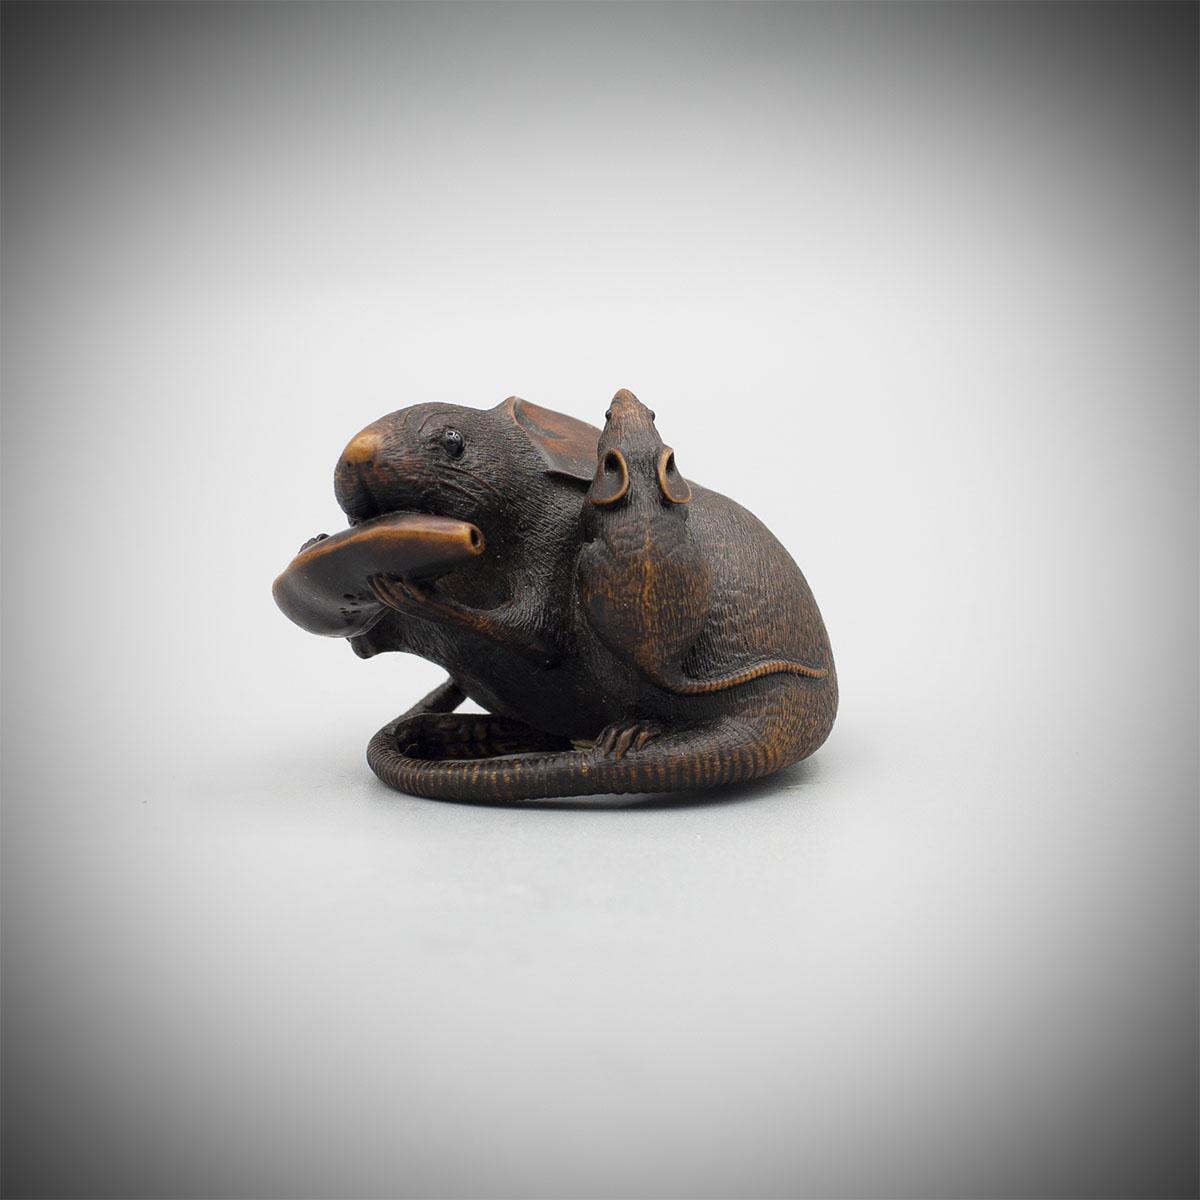 Wood okimono netsuke of rats by Hokyudo Itsumin, MR3642_v.1